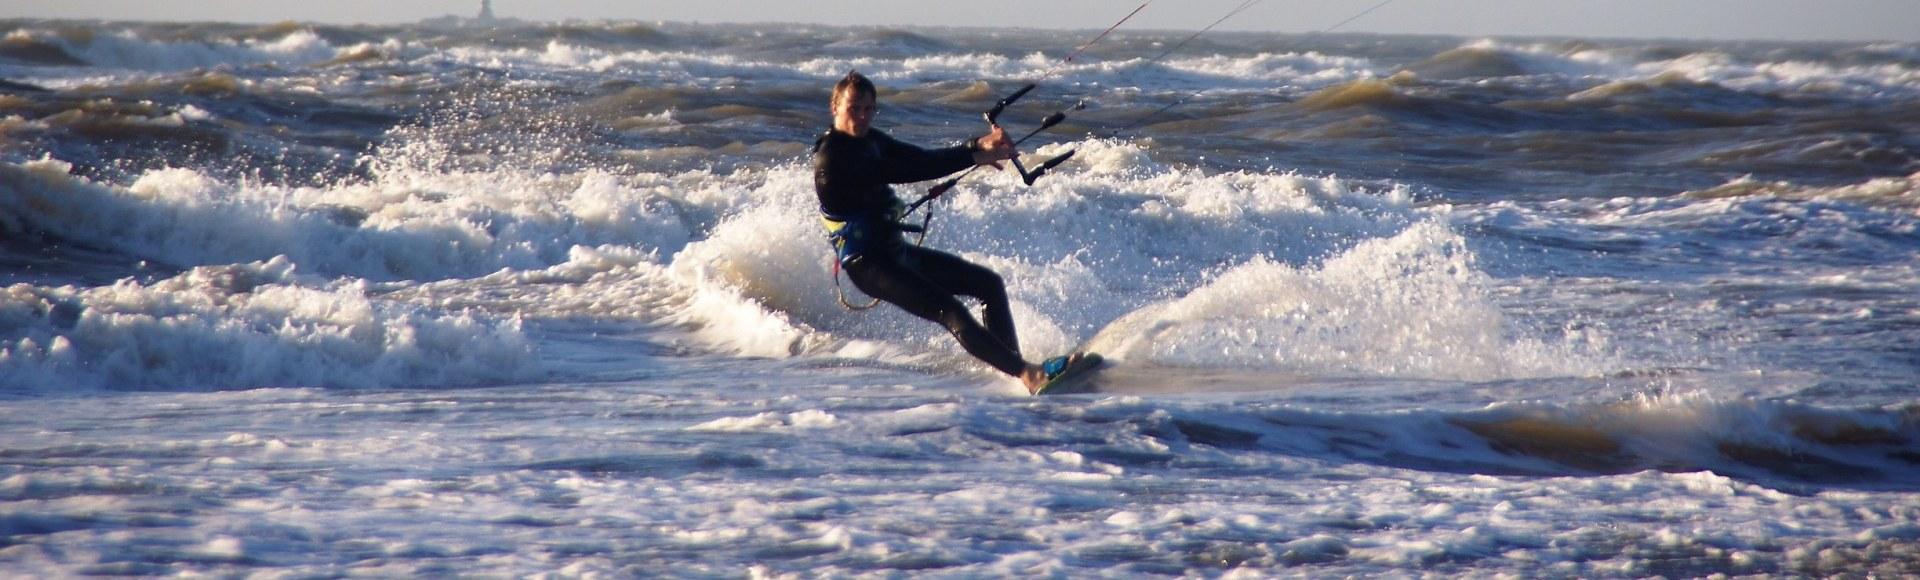 Kitesurf Les Bloemendaal